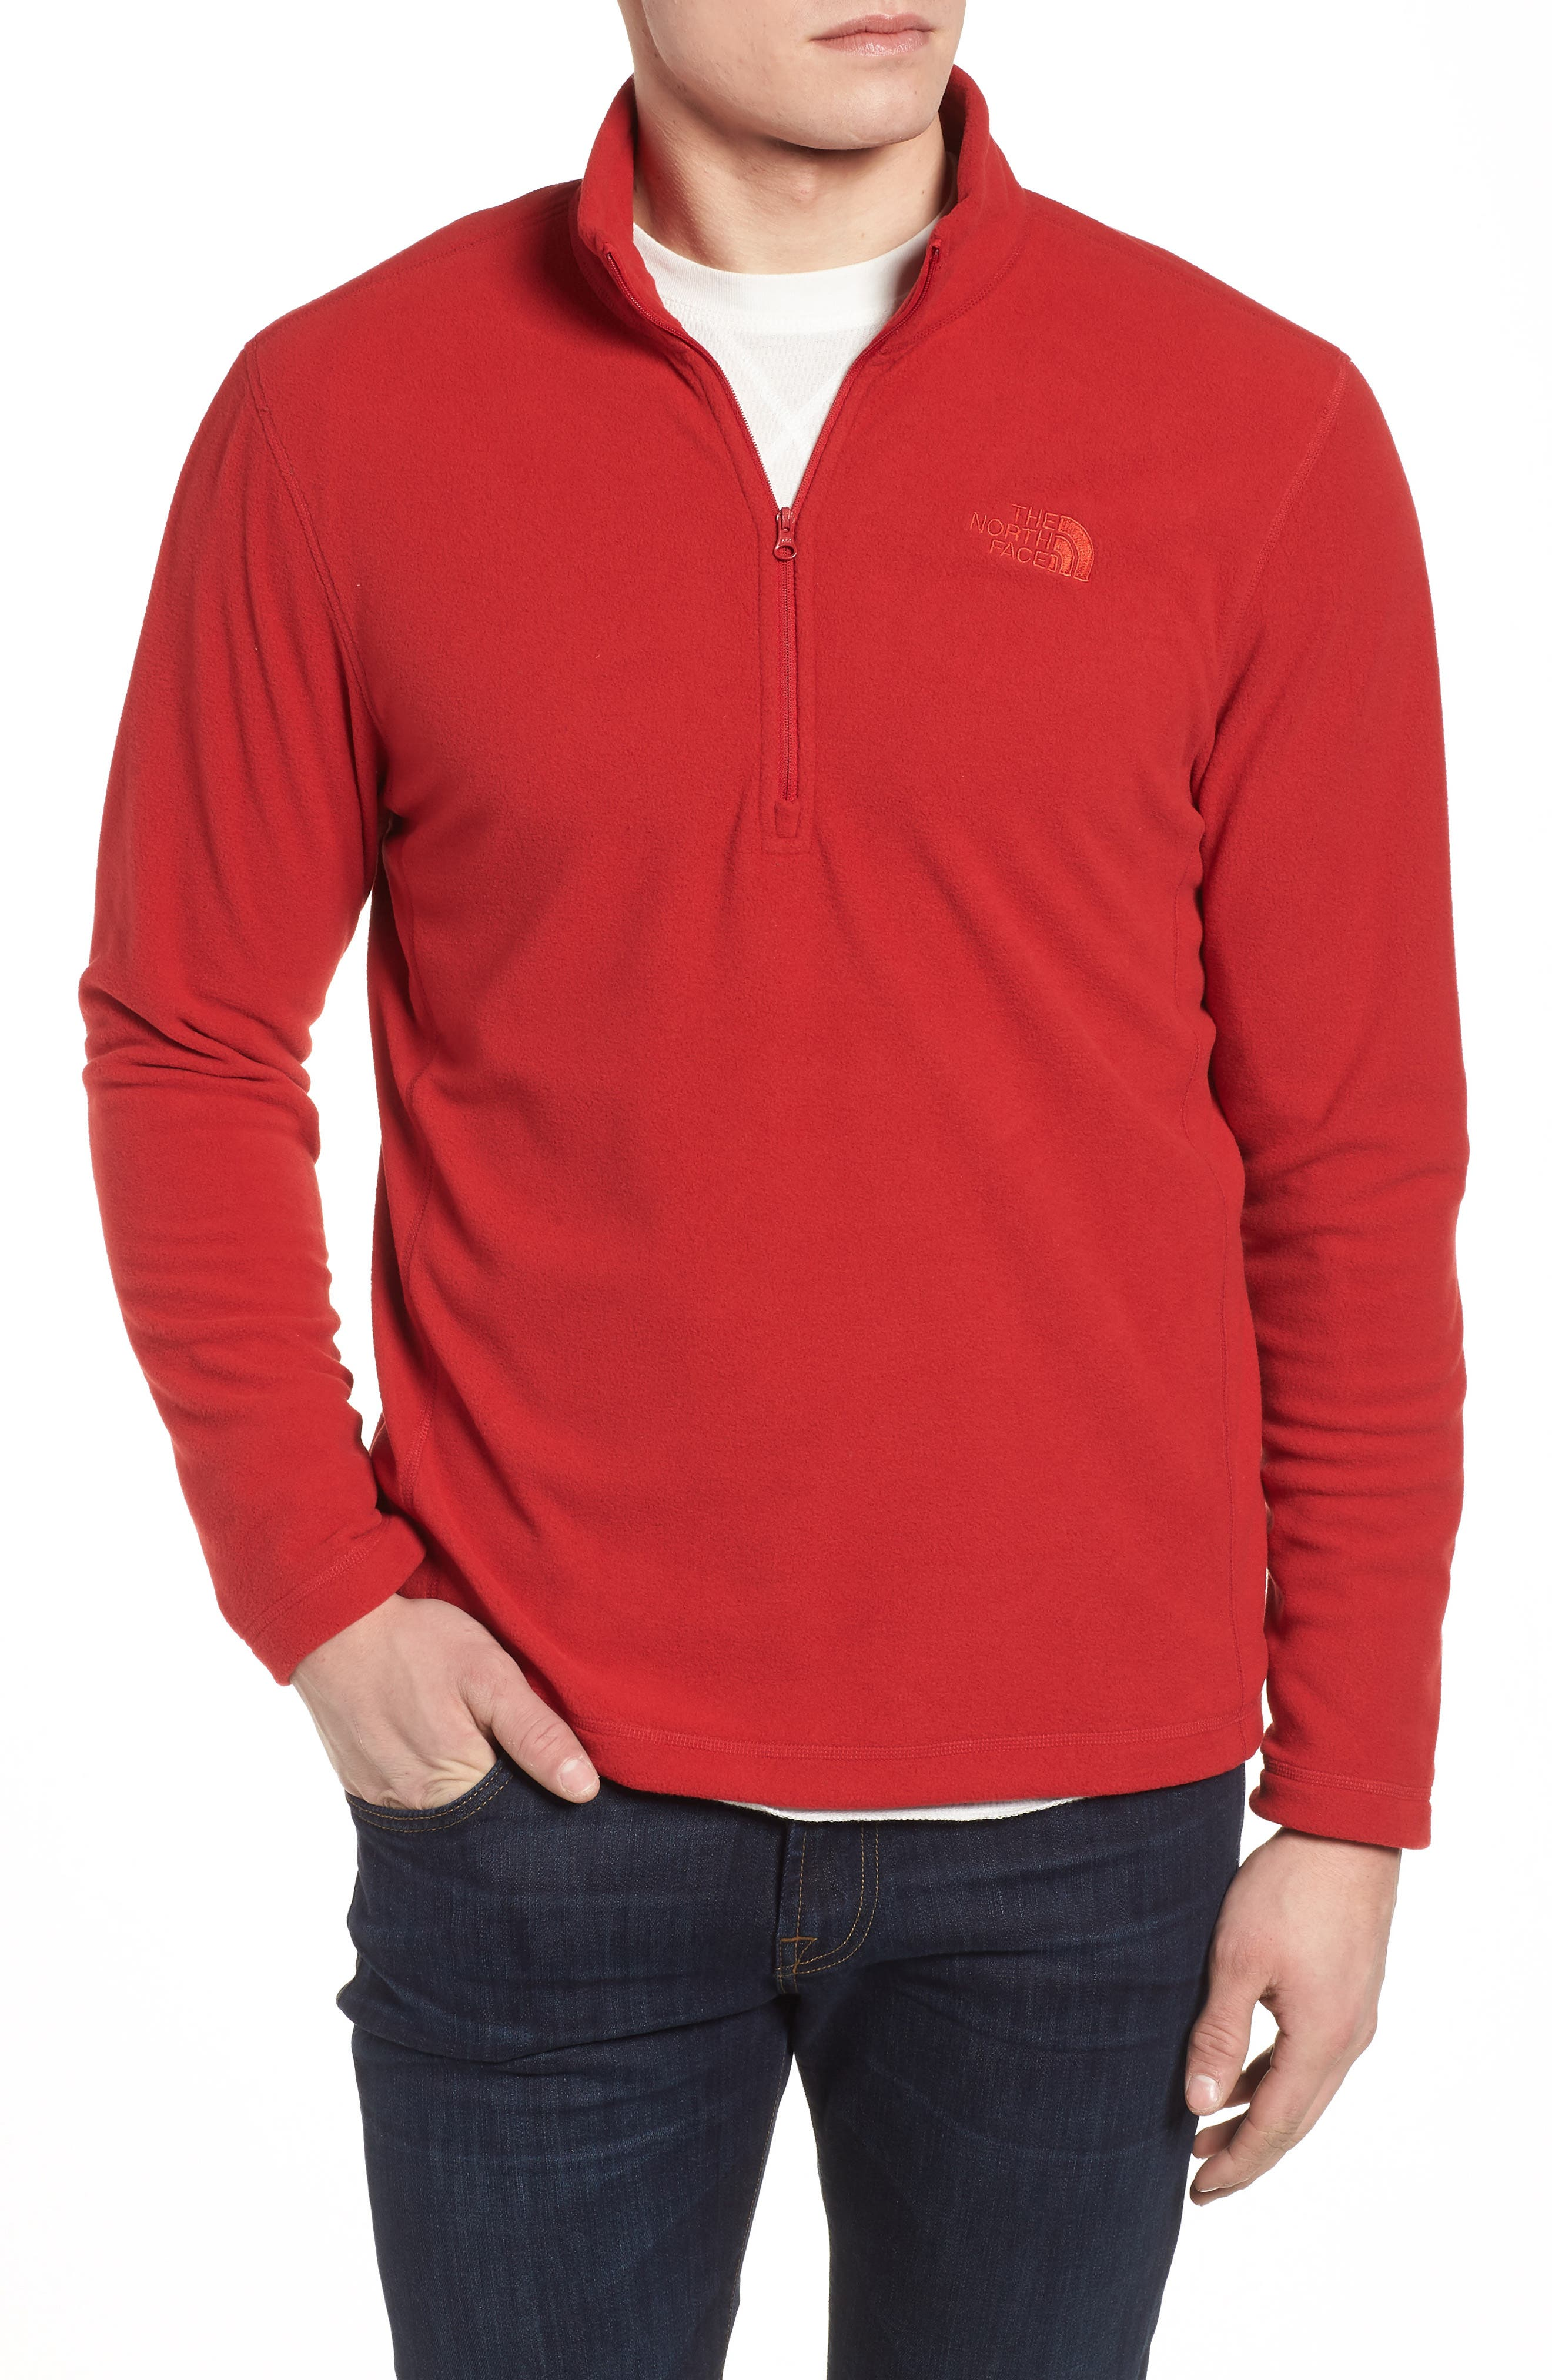 'TKA 100 Glacier' Quarter Zip Fleece Pullover,                         Main,                         color, RAGE RED/ RAGE RED